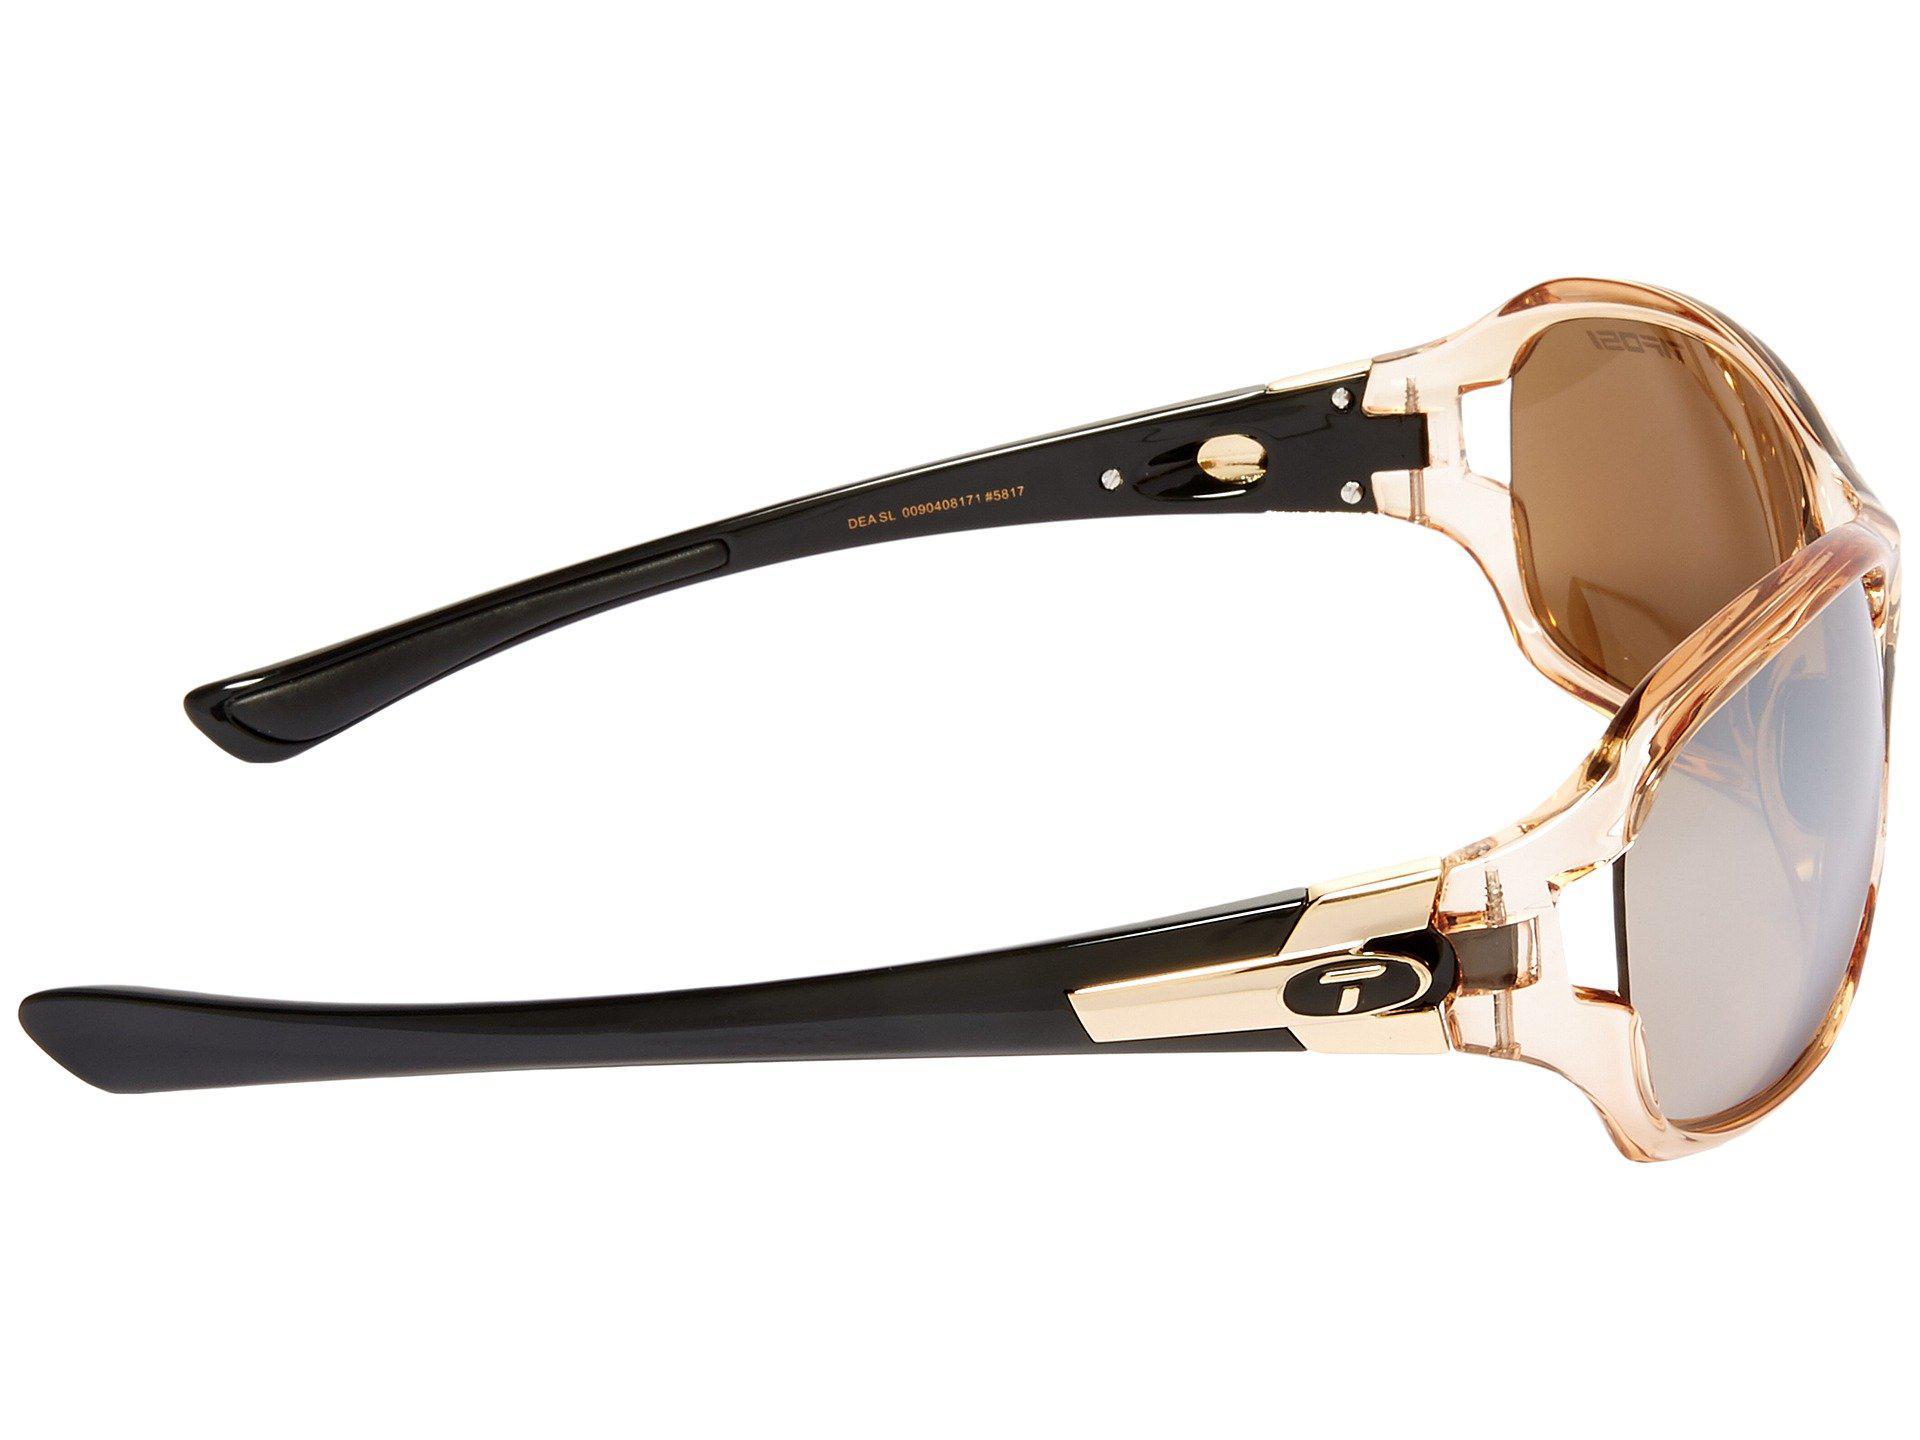 5253d64ef5 Tifosi Optics - Dea Sl (crystal Brown black) Sport Sunglasses - Lyst. View  fullscreen